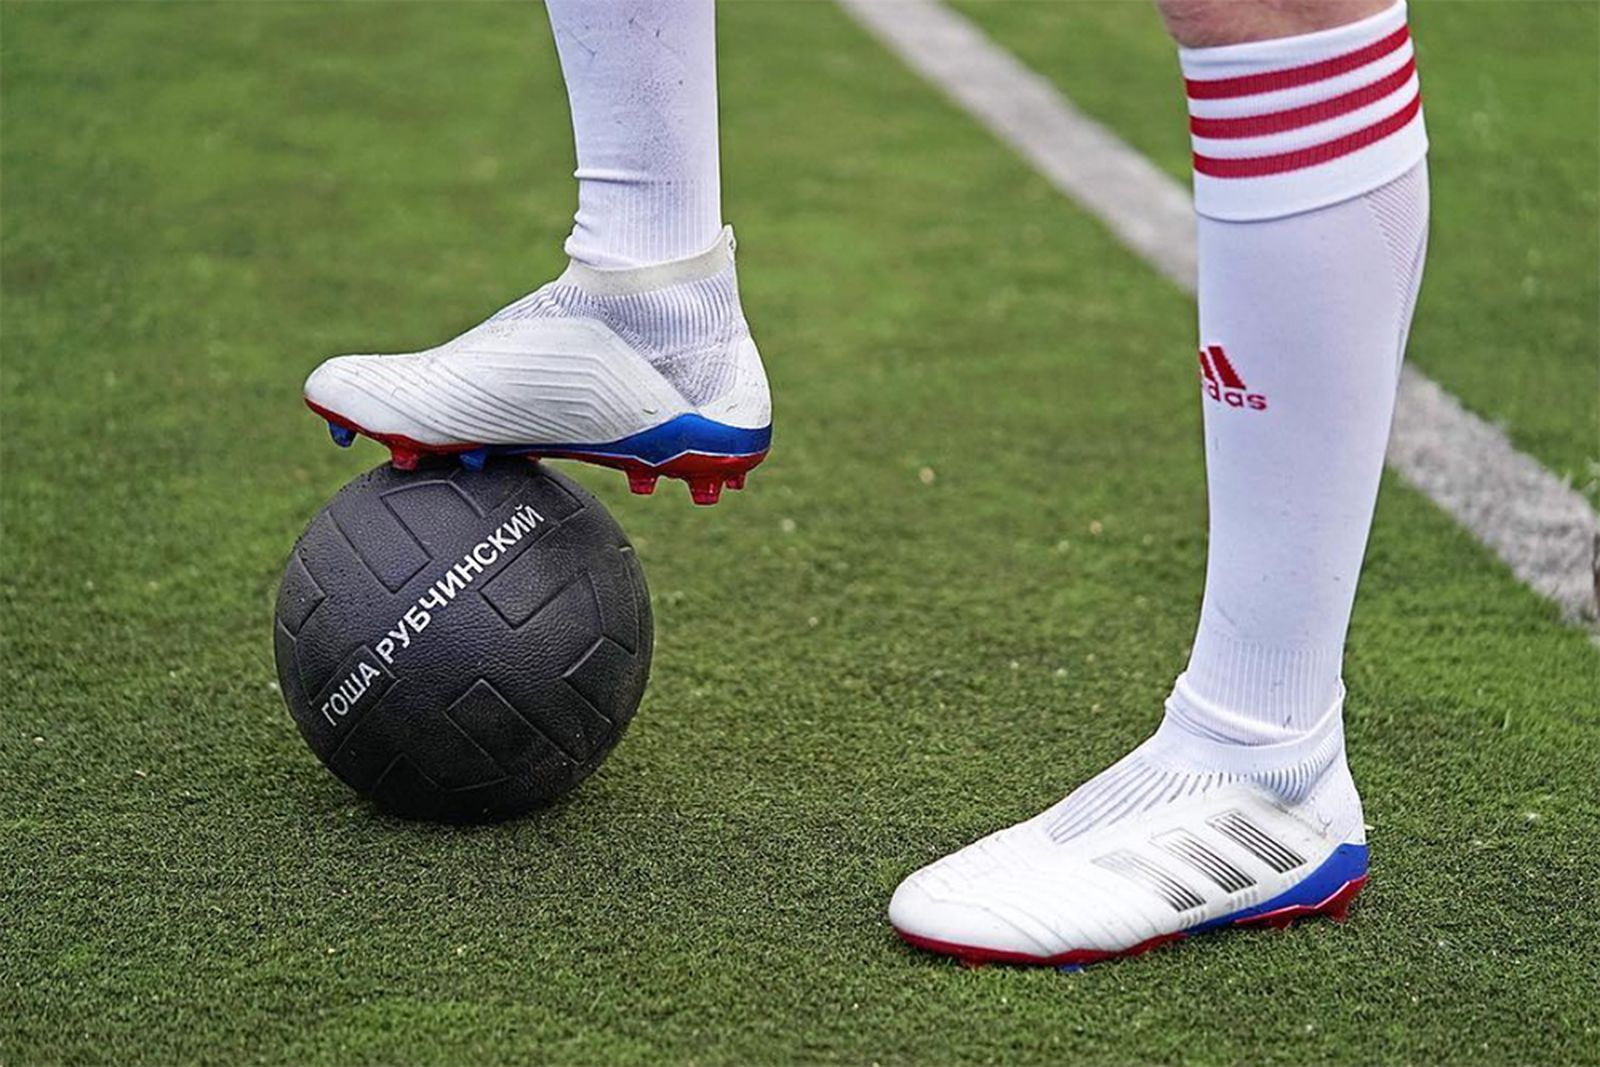 gosha rubchinskiy adidas football world cup capsule 2018 FIFA World Cup